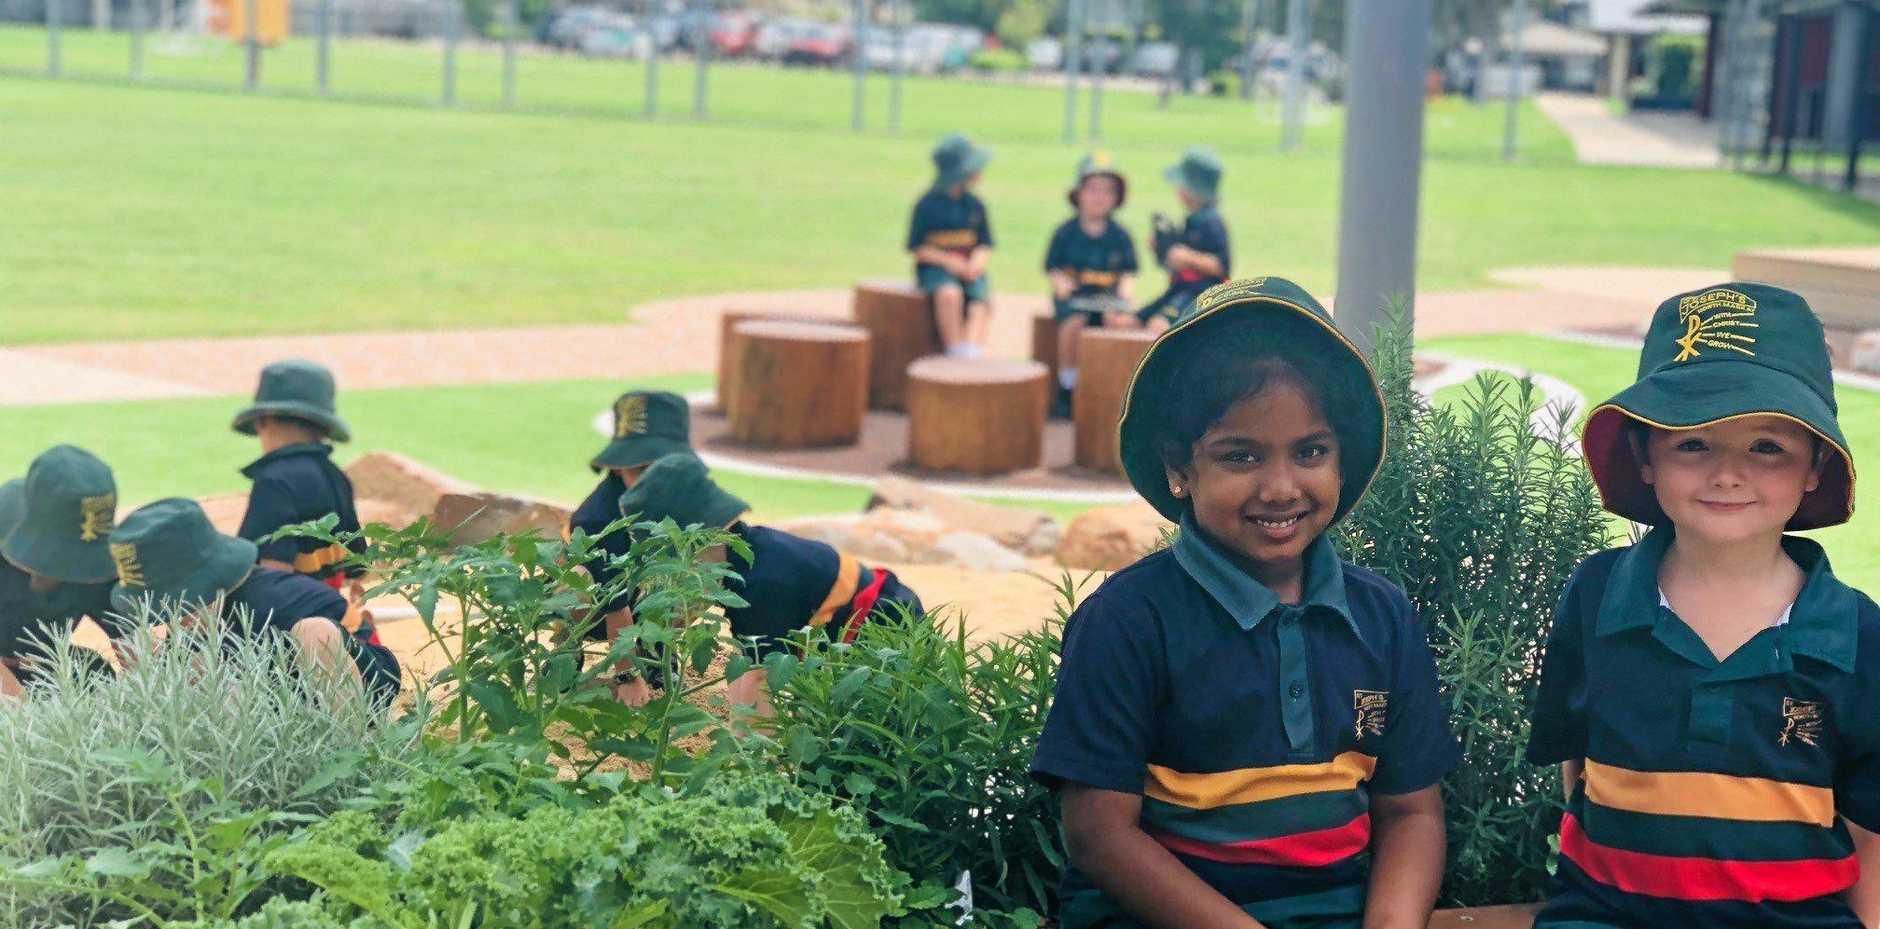 St Joseph's Catholic Primary School Students, Kaitlyn Silveira and William McKenna sit among one of their already vibrant school veggie gardens.